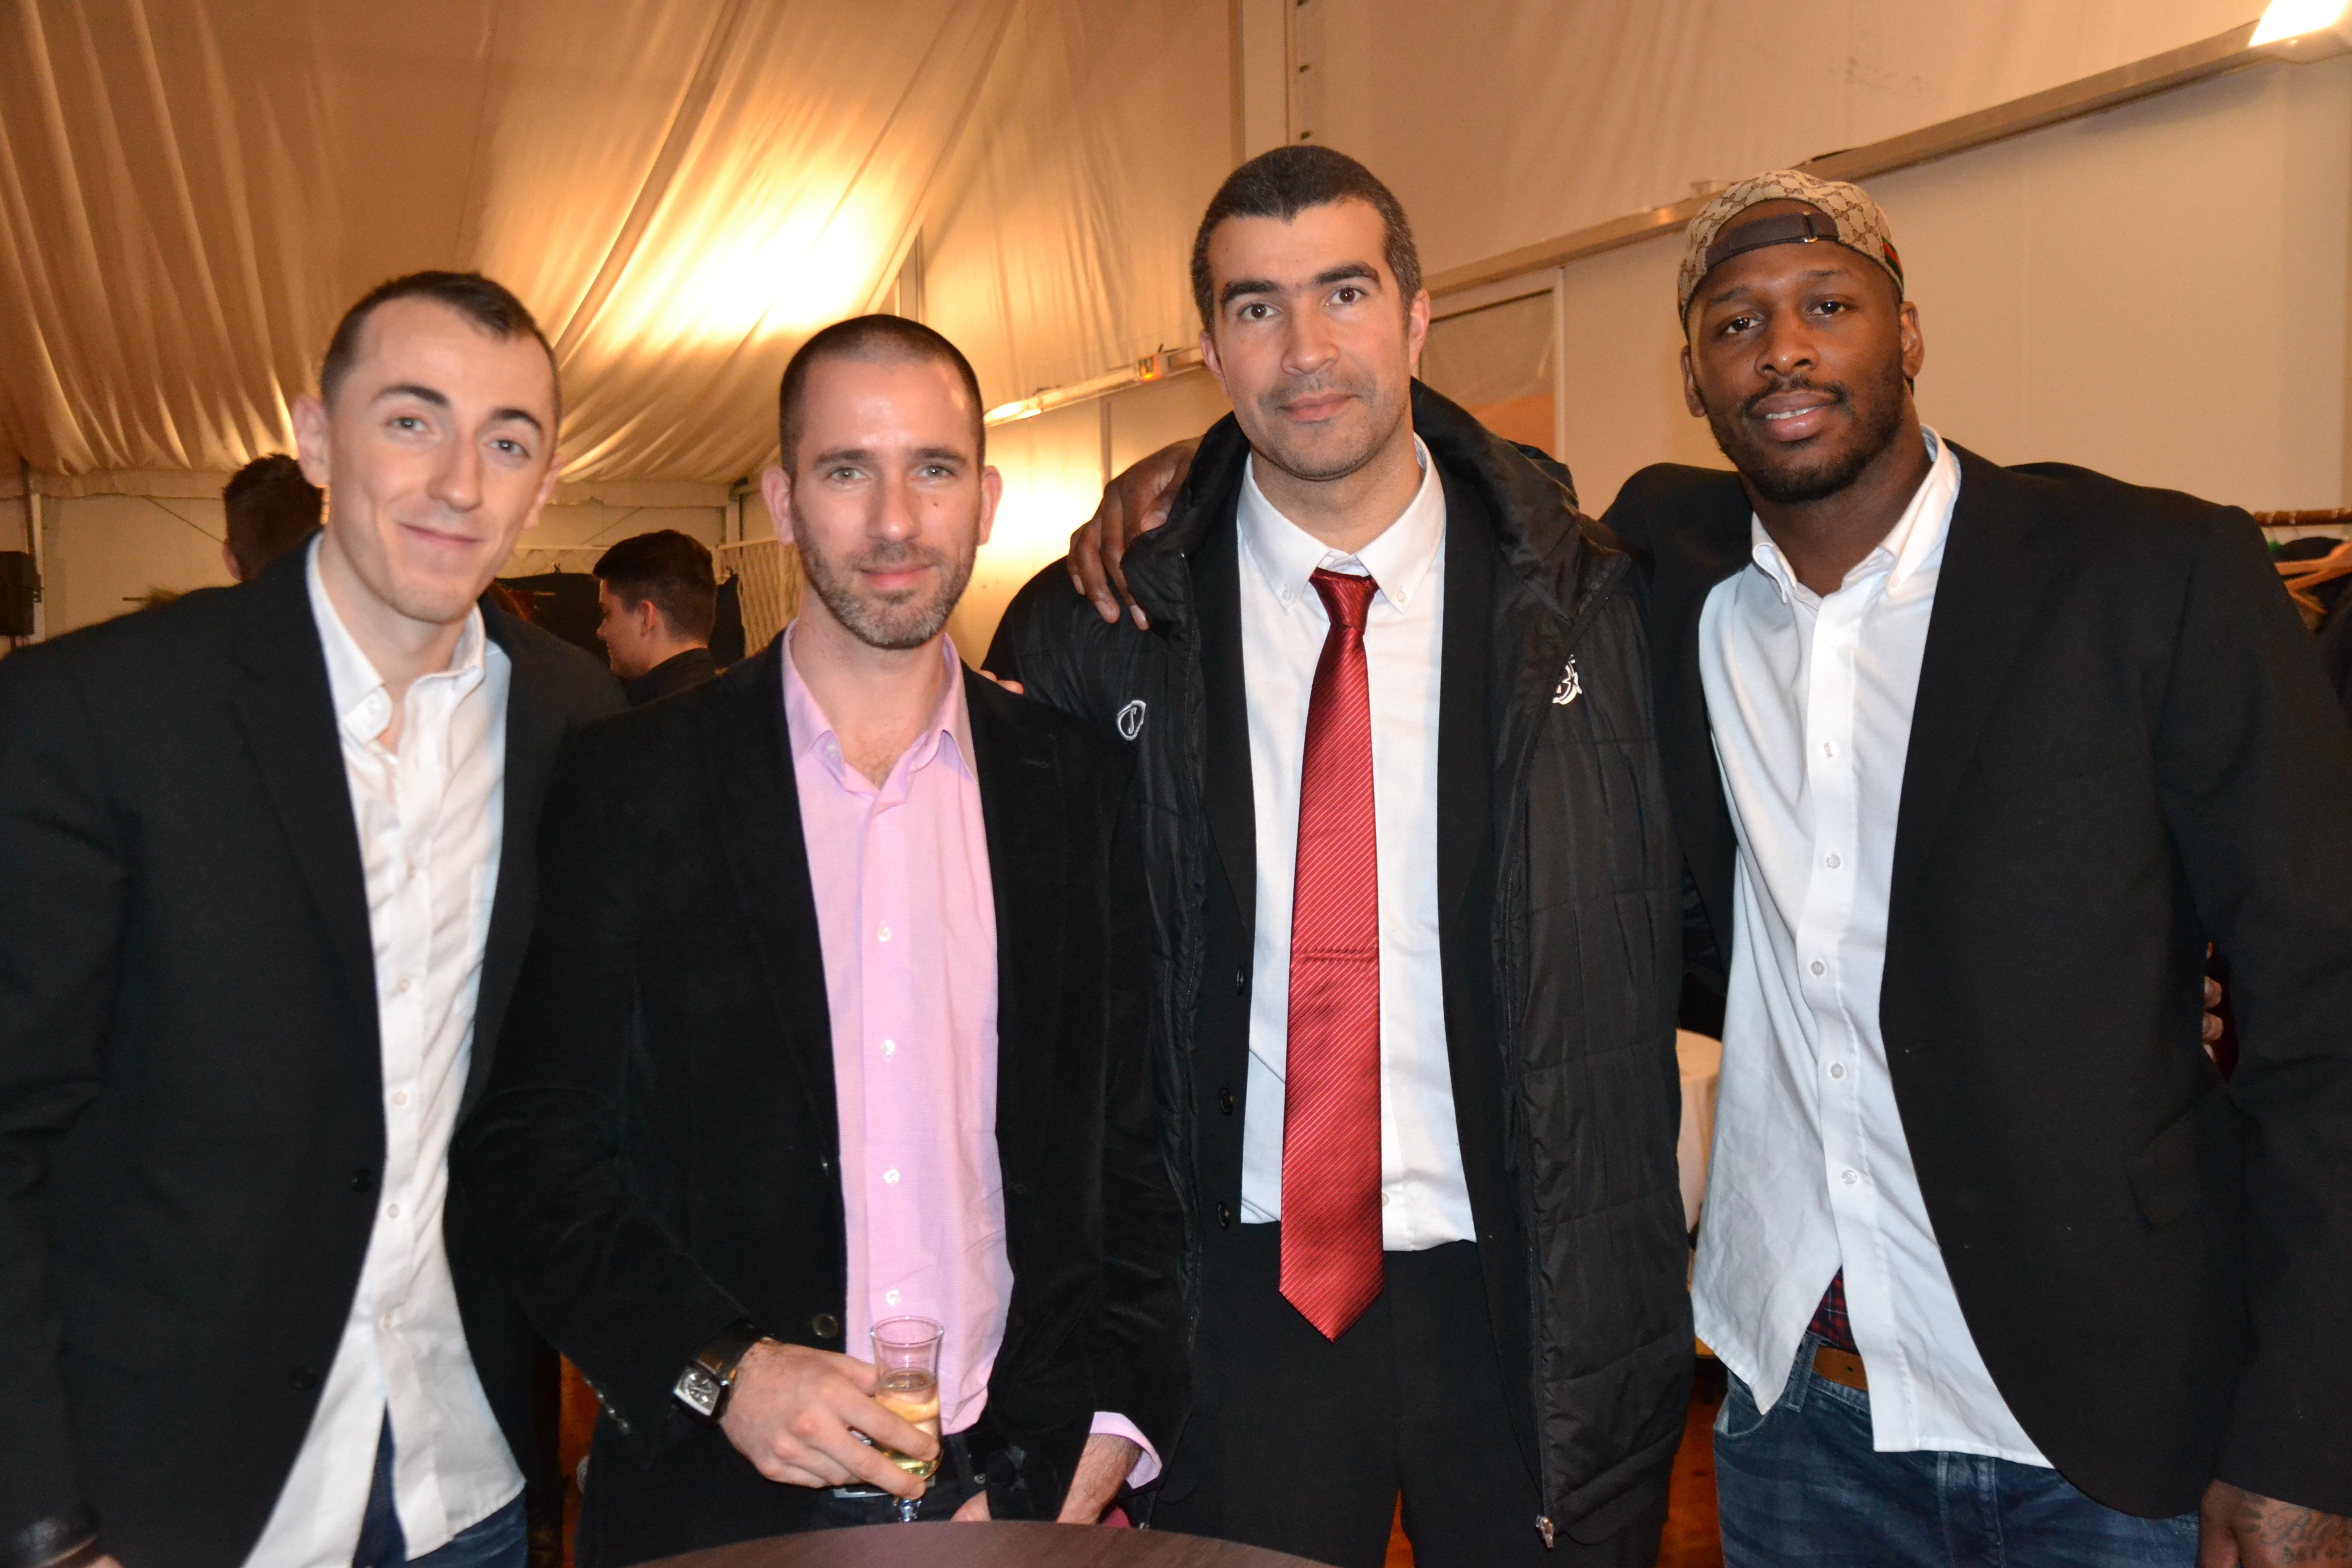 Jonathan ROUSSELLE, Jérôme NAVIER et Murphey HOLLOWAY